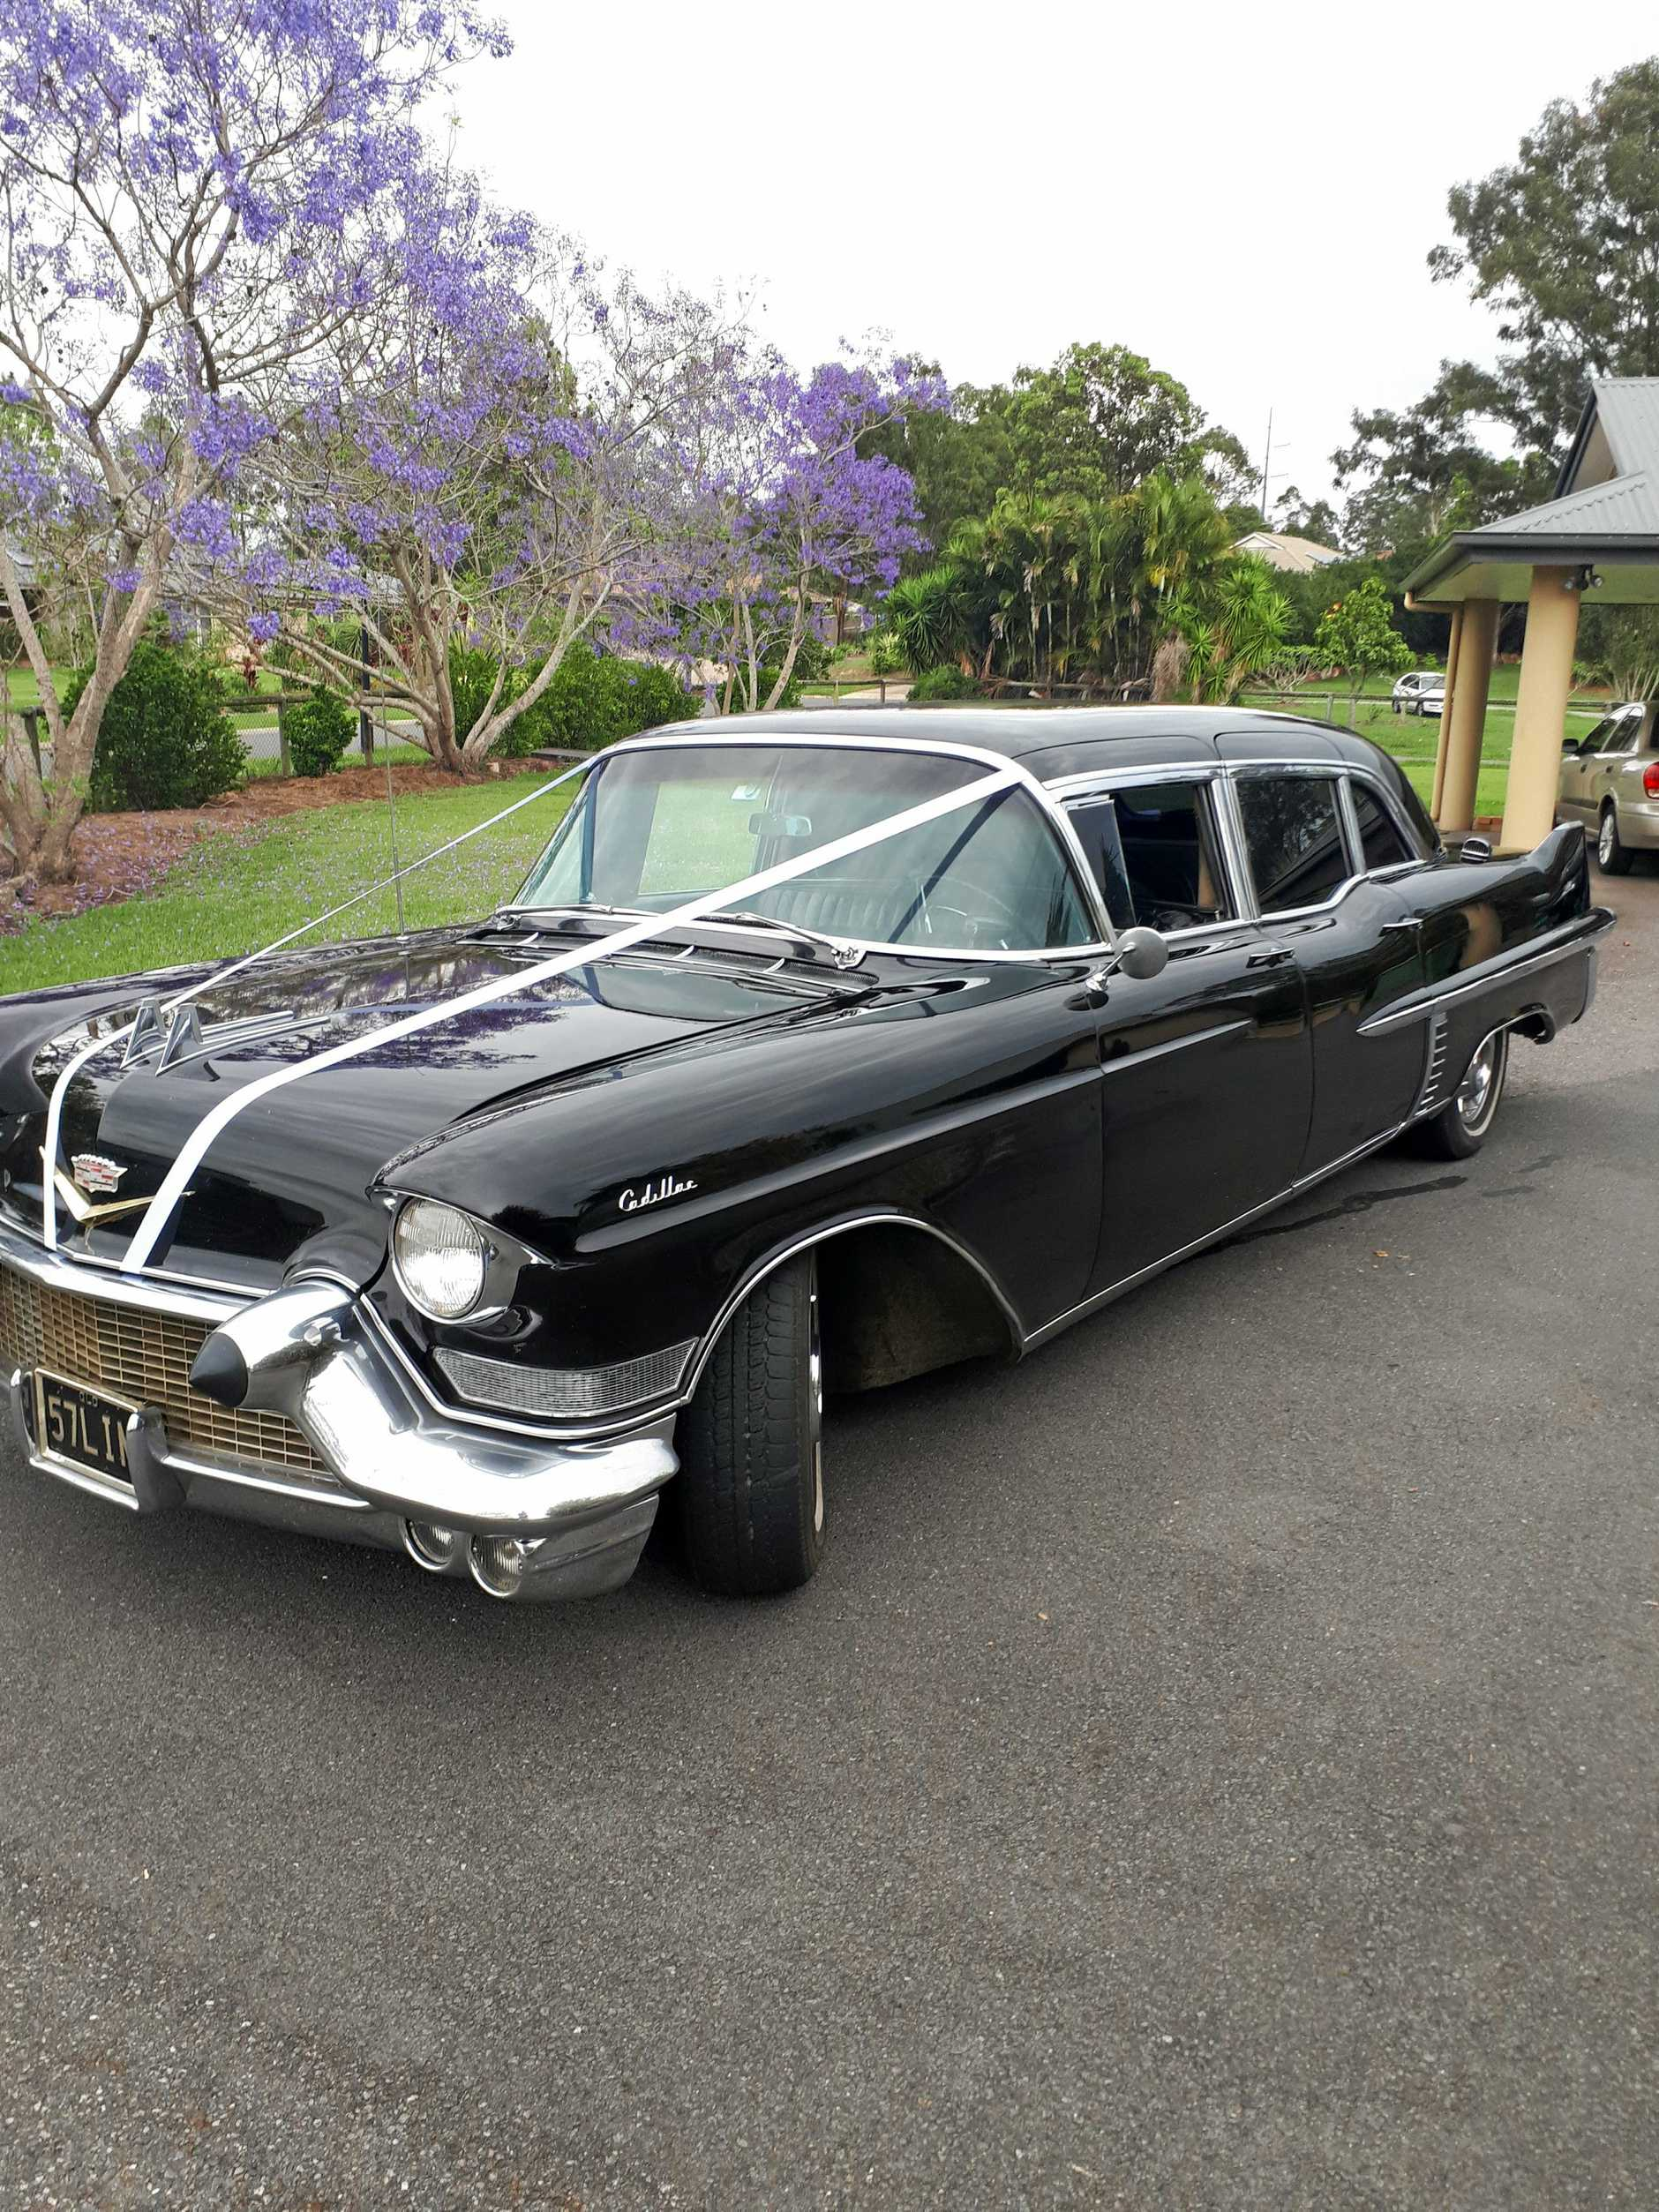 Steven Kilmek's rare 1957 Cadillac limousine.